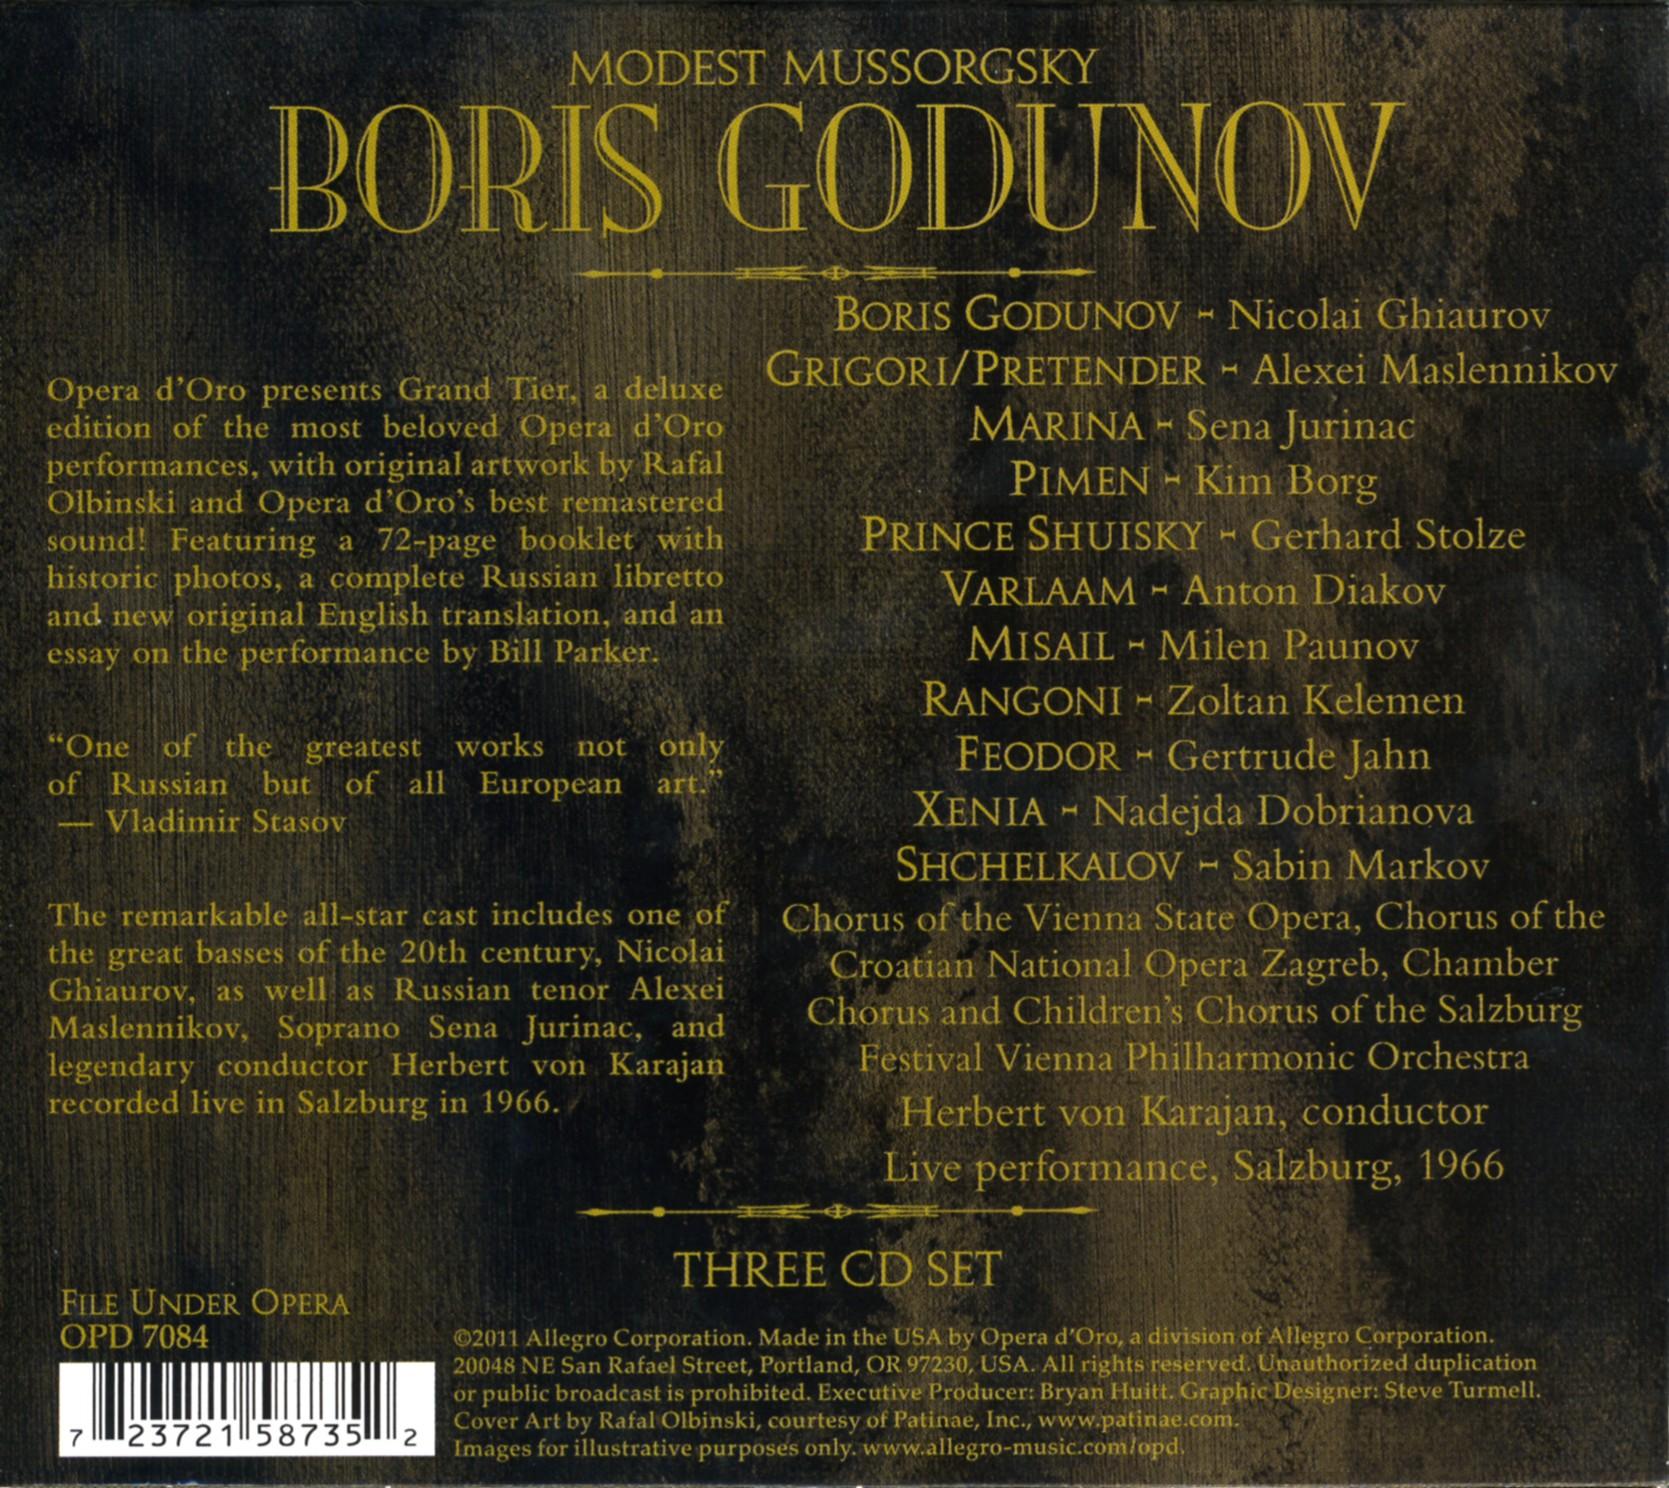 English Essay Pmr Boris Godunov  Salzburg  Buy An Essay Paper also High School Dropout Essay New Arts International  Products American Dream Essay Thesis